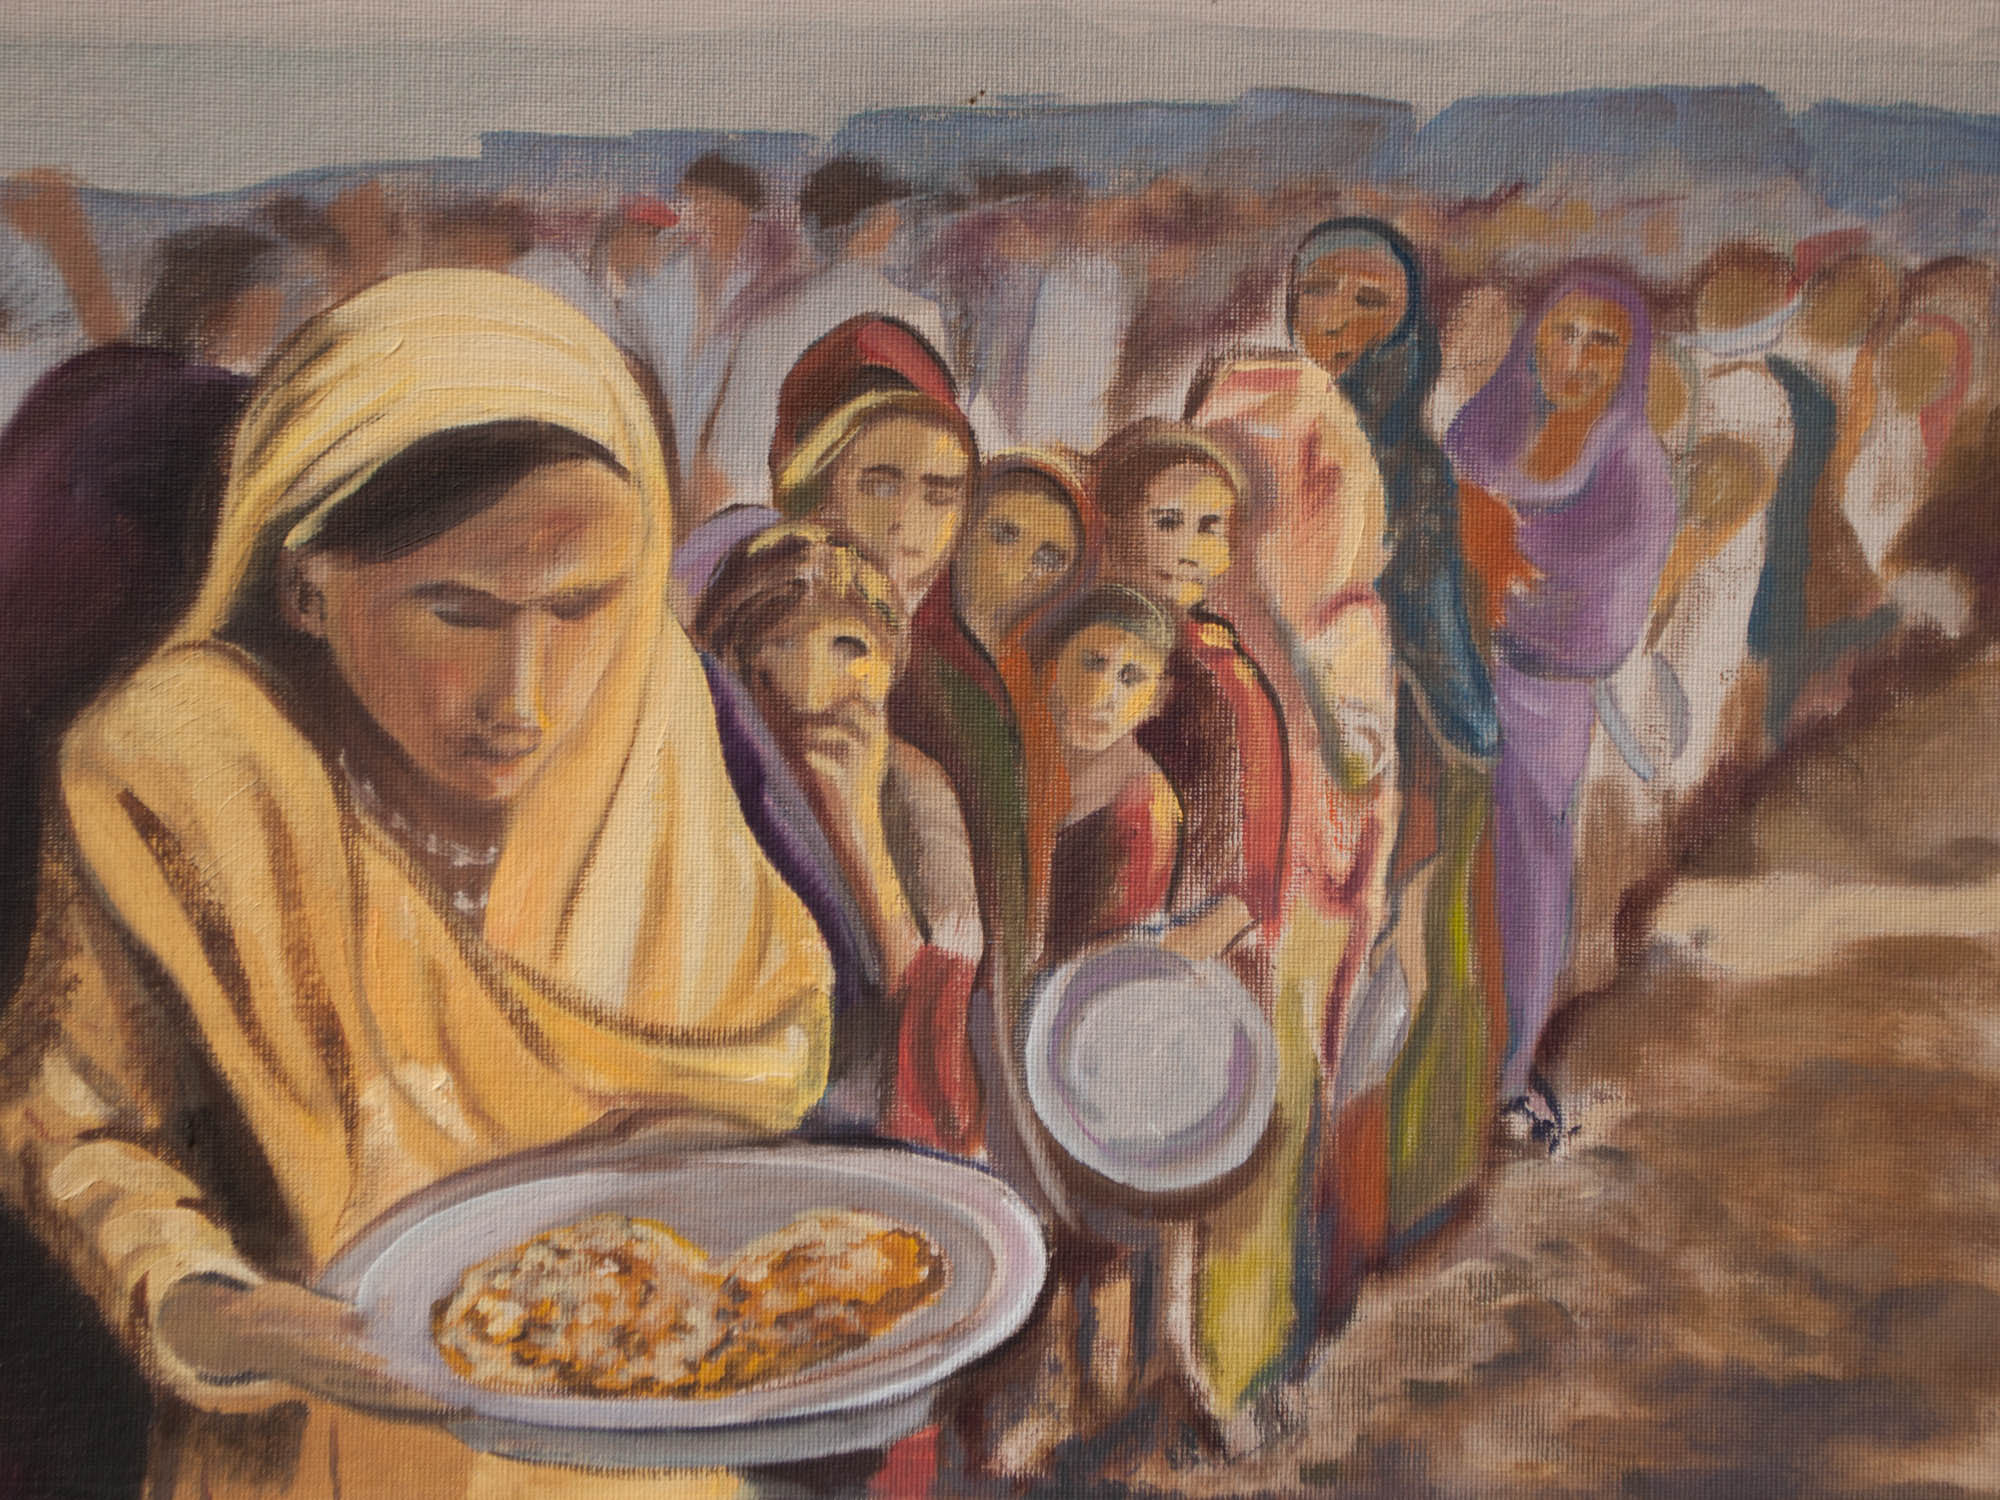 "Food Line / Pakistan, 12"" x 16"" Oil on Canvas Board, 2012"